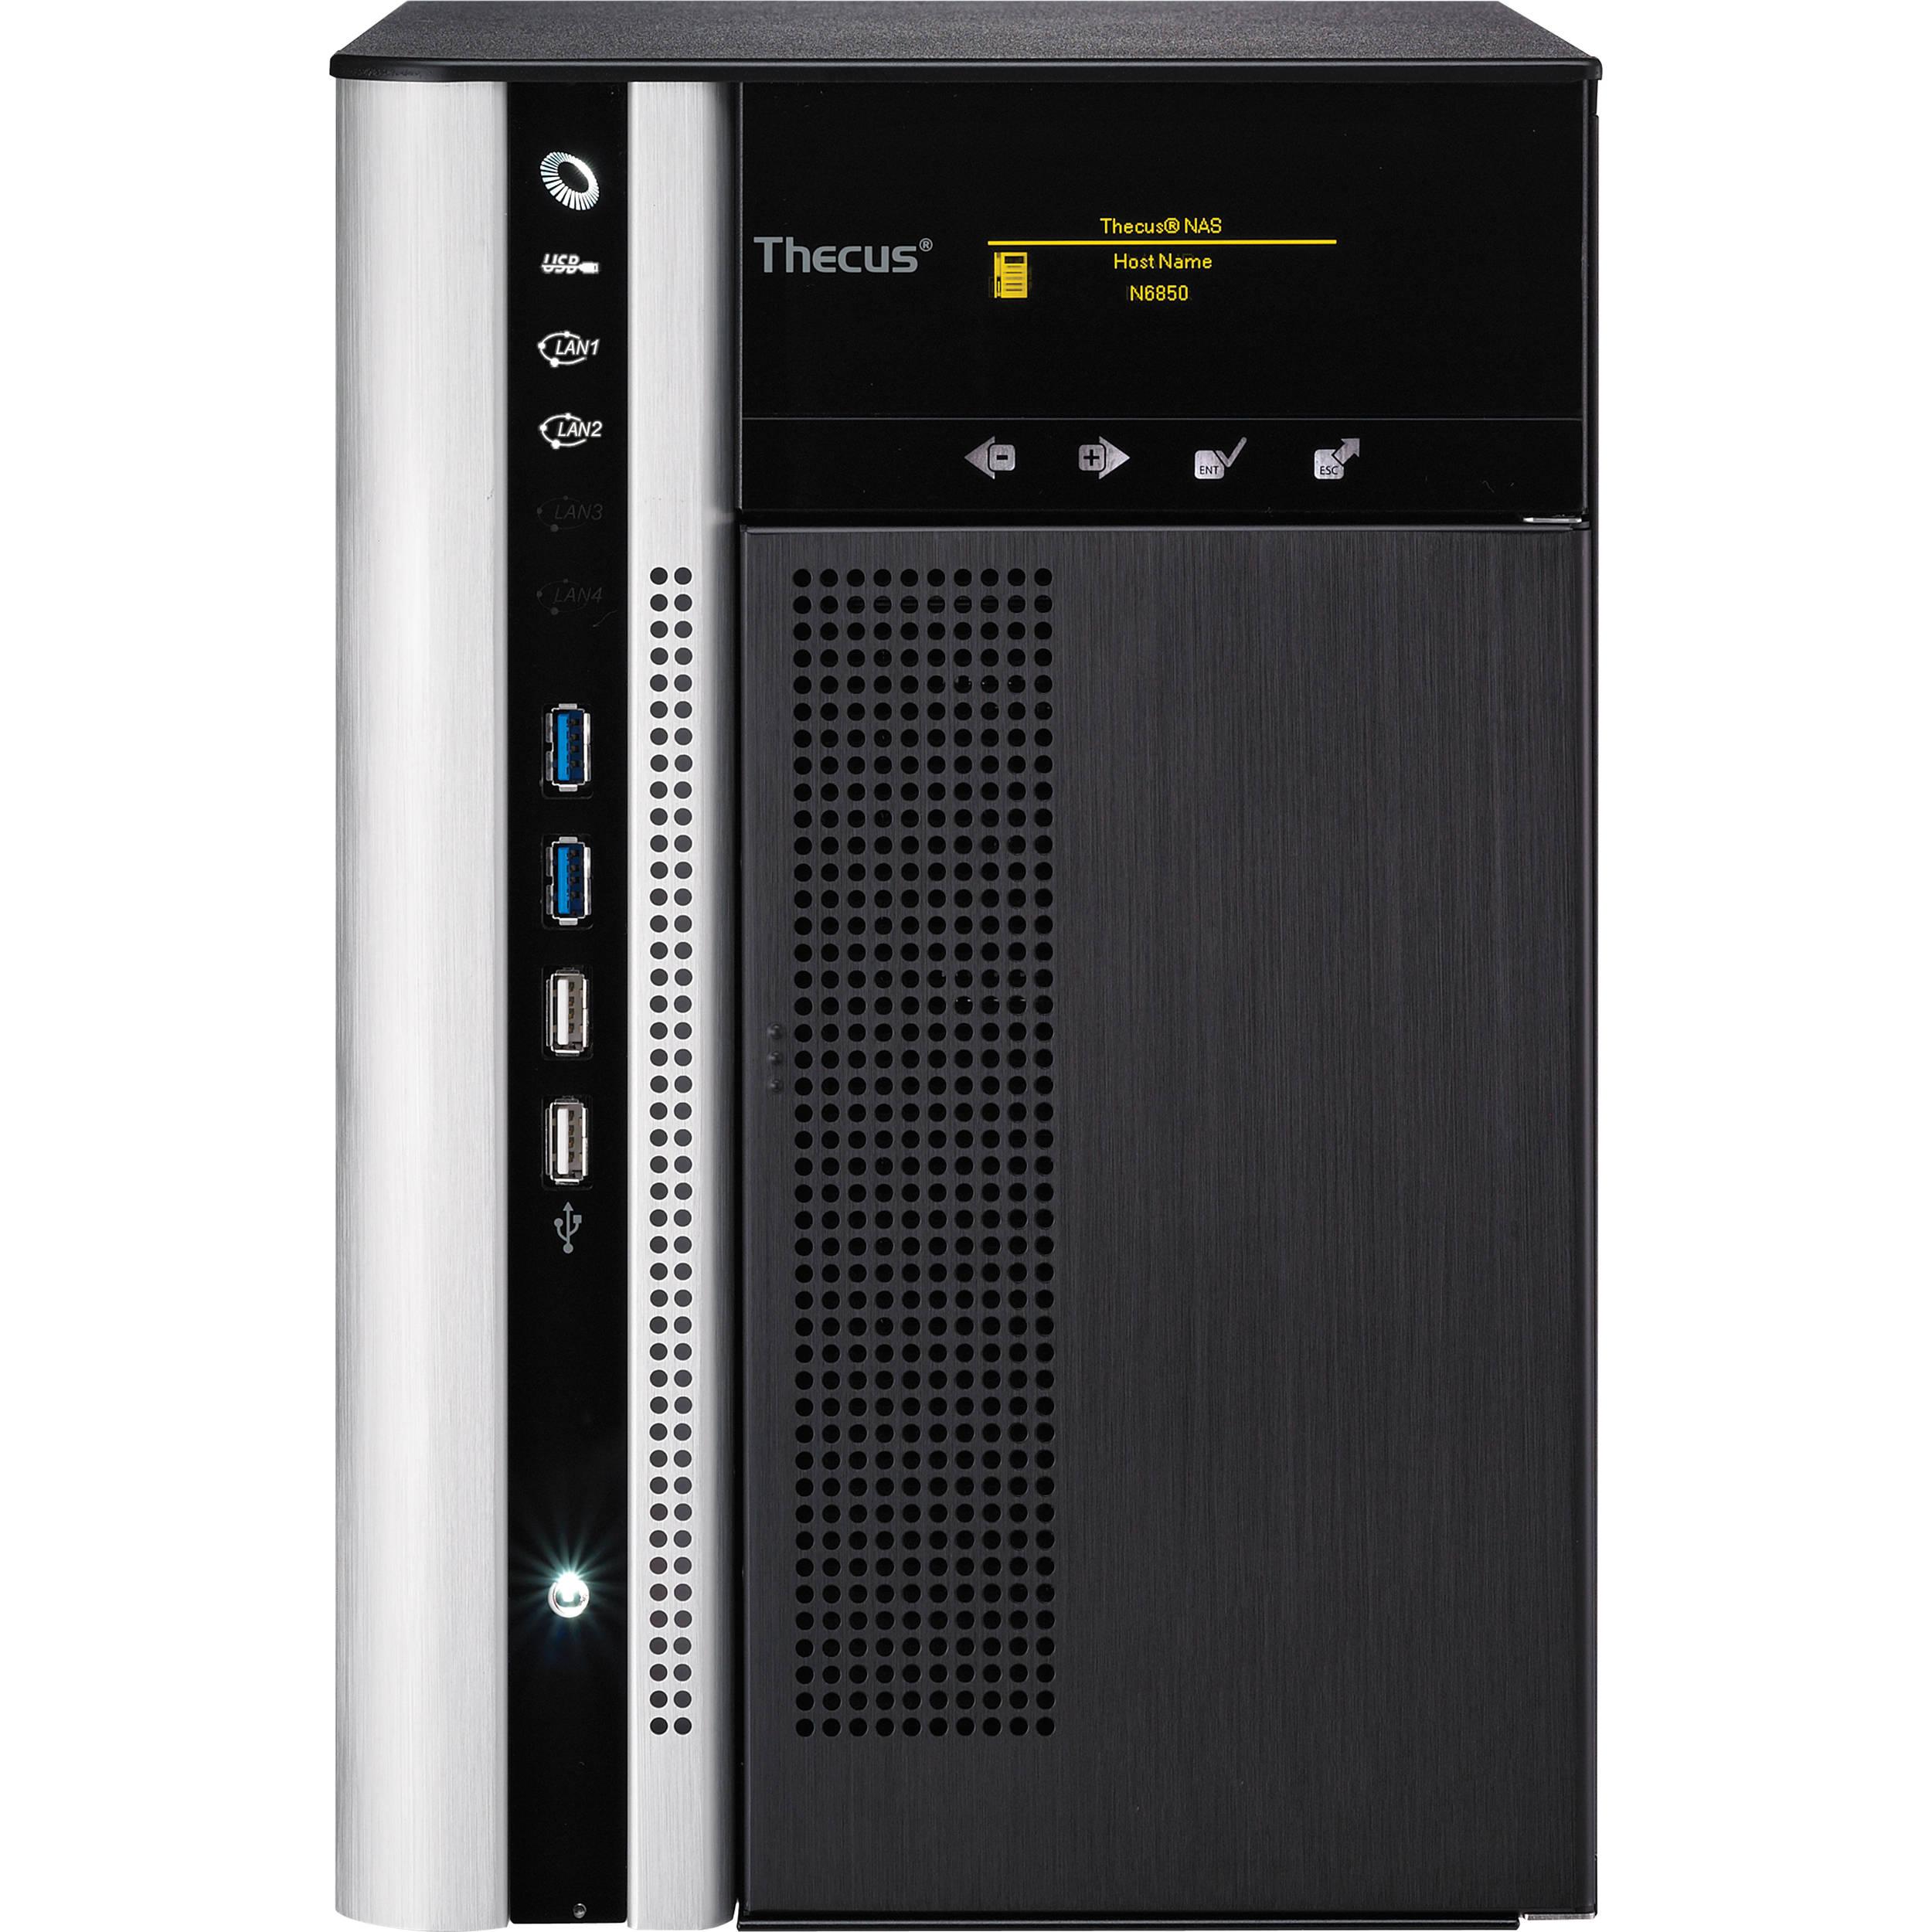 Thecus N6850 TopTower NAS Server Driver